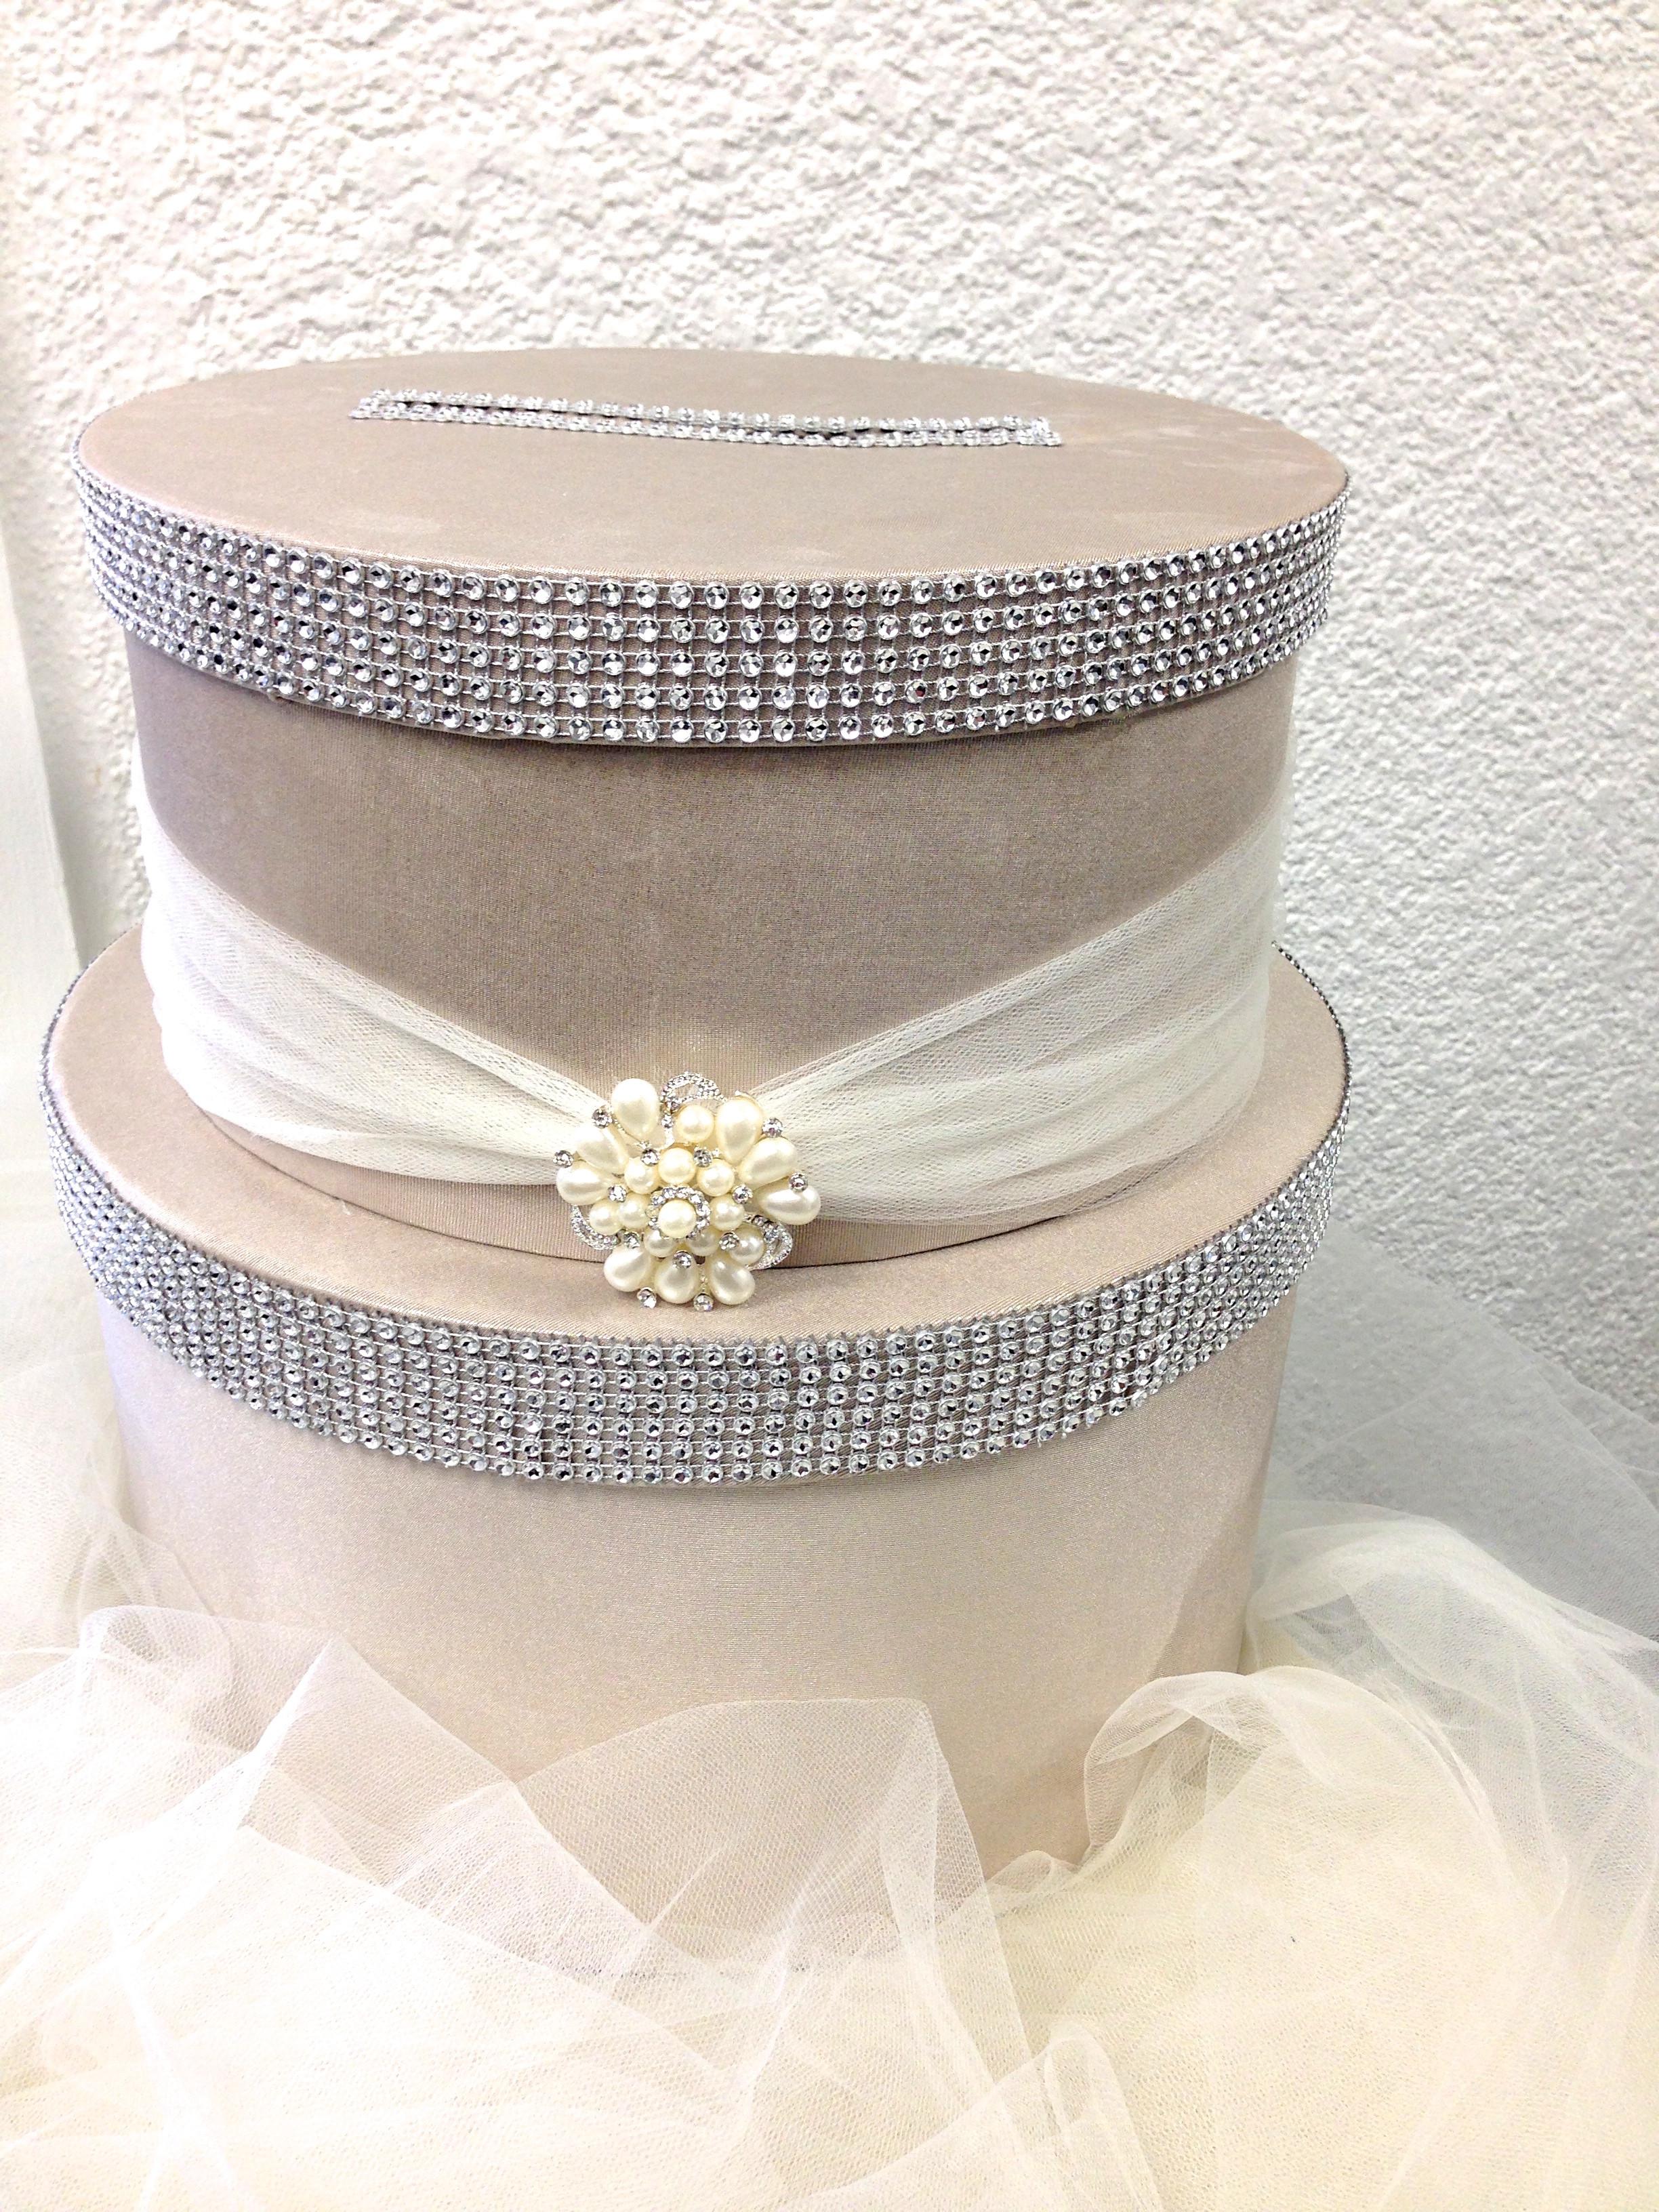 Best ideas about Wedding Card Box DIY . Save or Pin DIY Wedding Card Box Now.